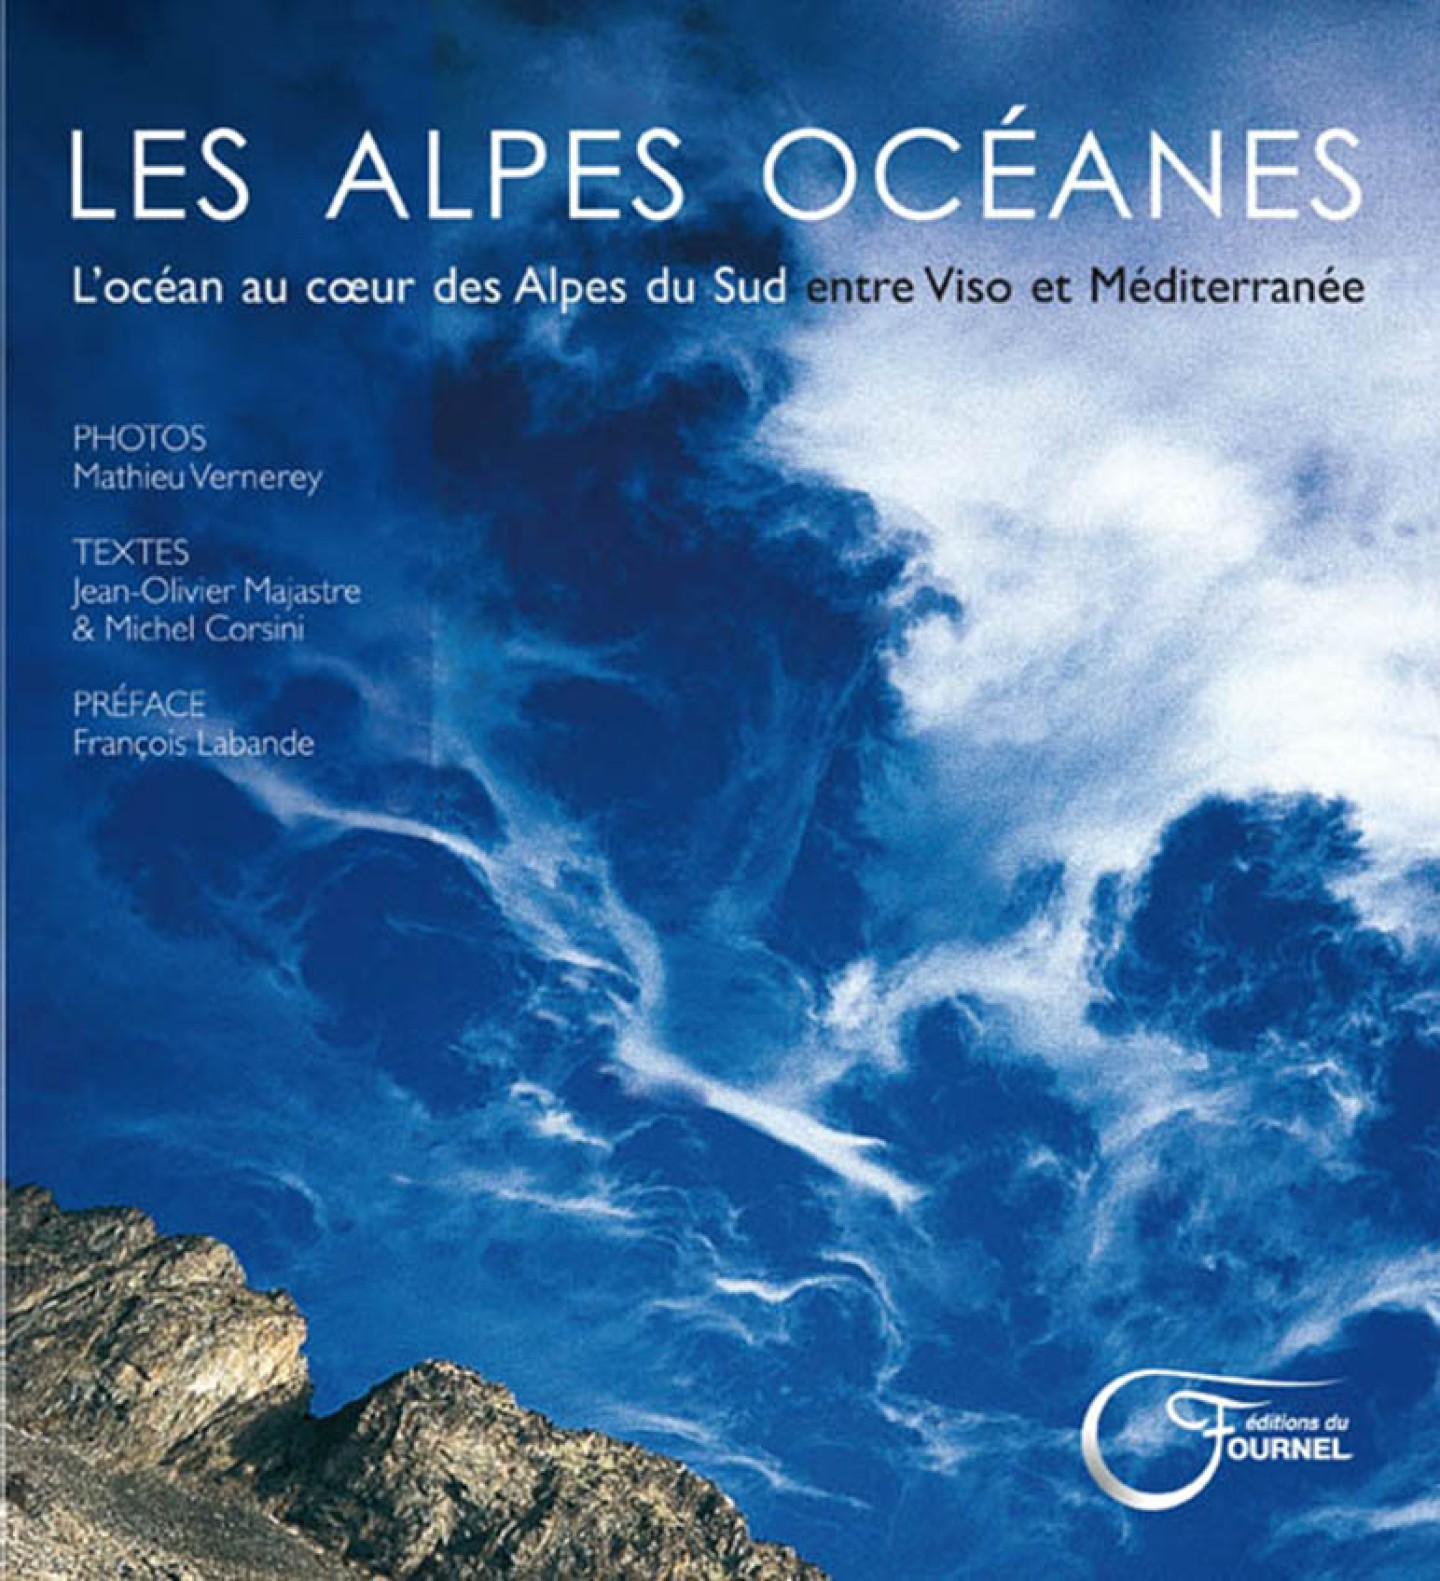 Les Alpes océanes de Mathieu Vernerey